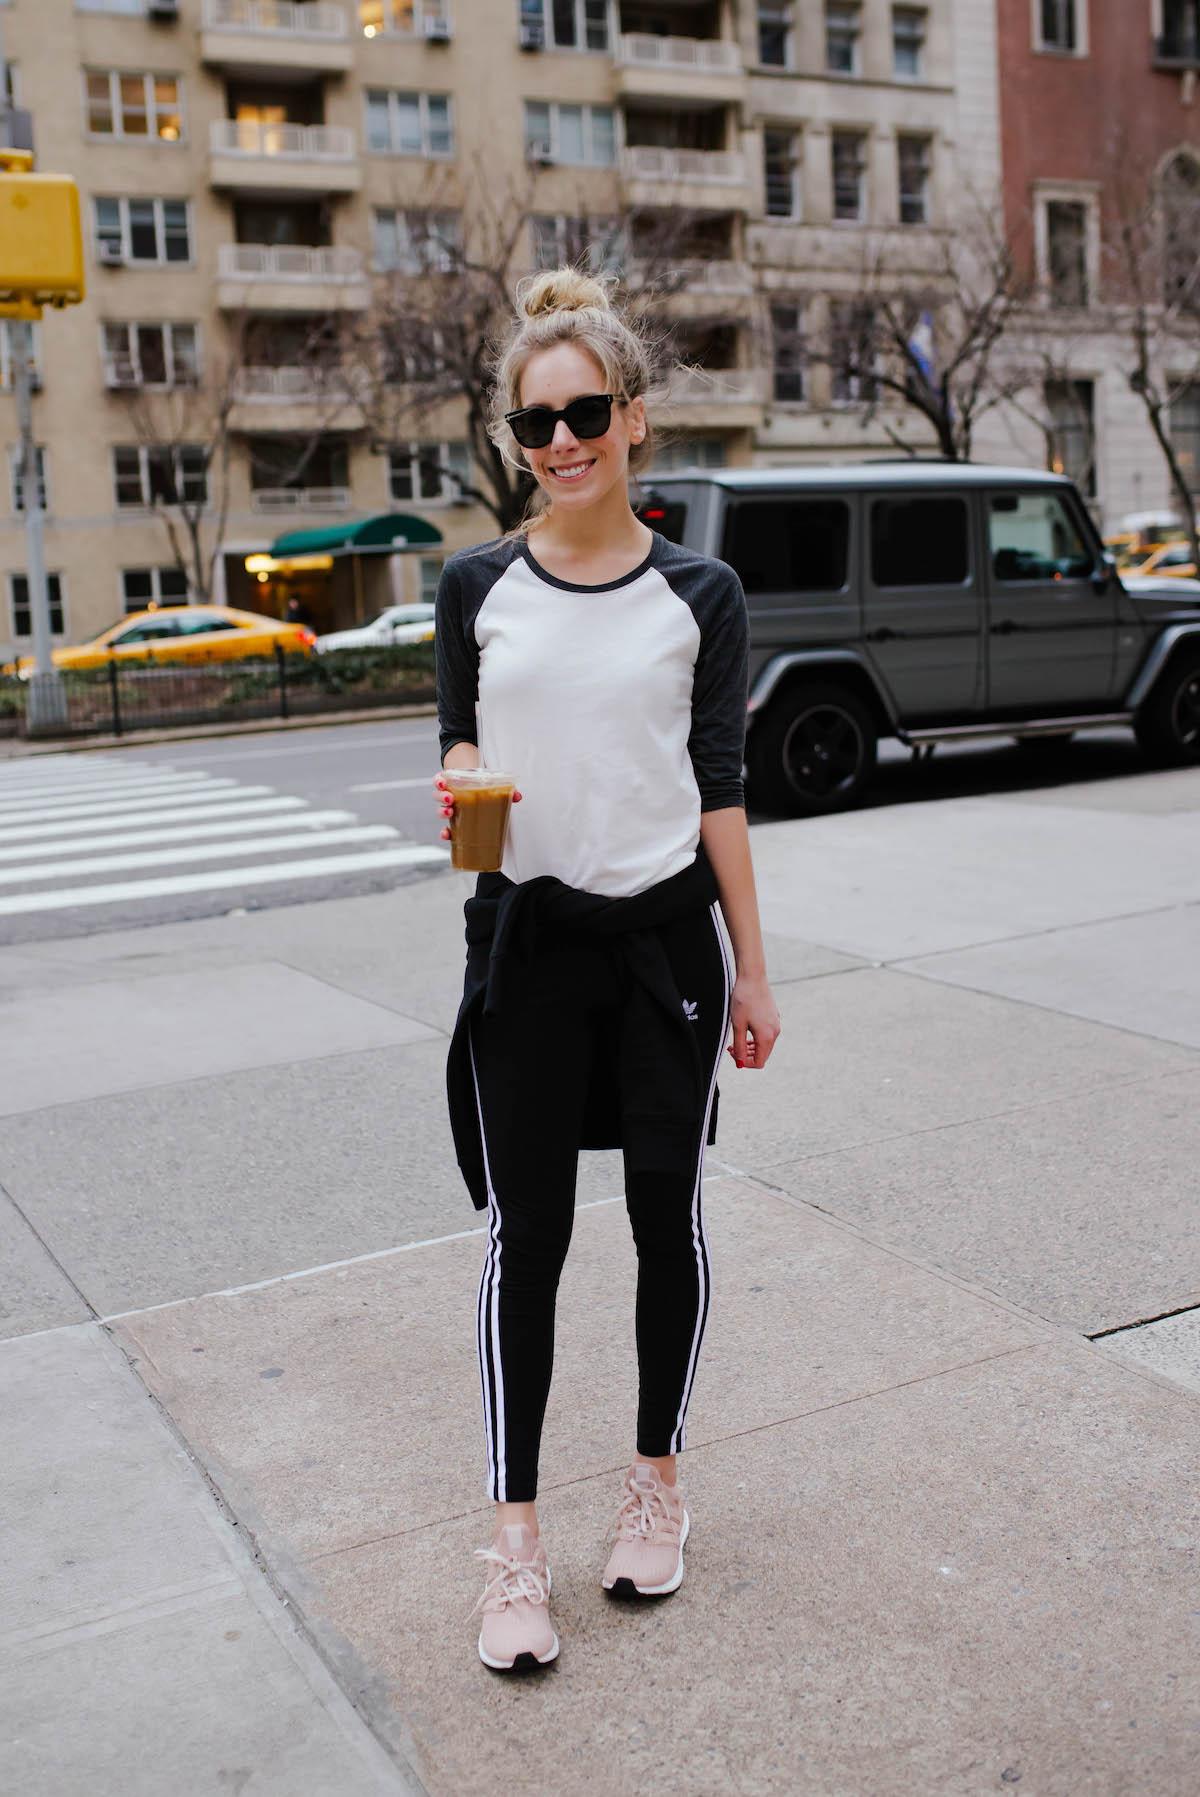 Adidas 3-Stripe Tights